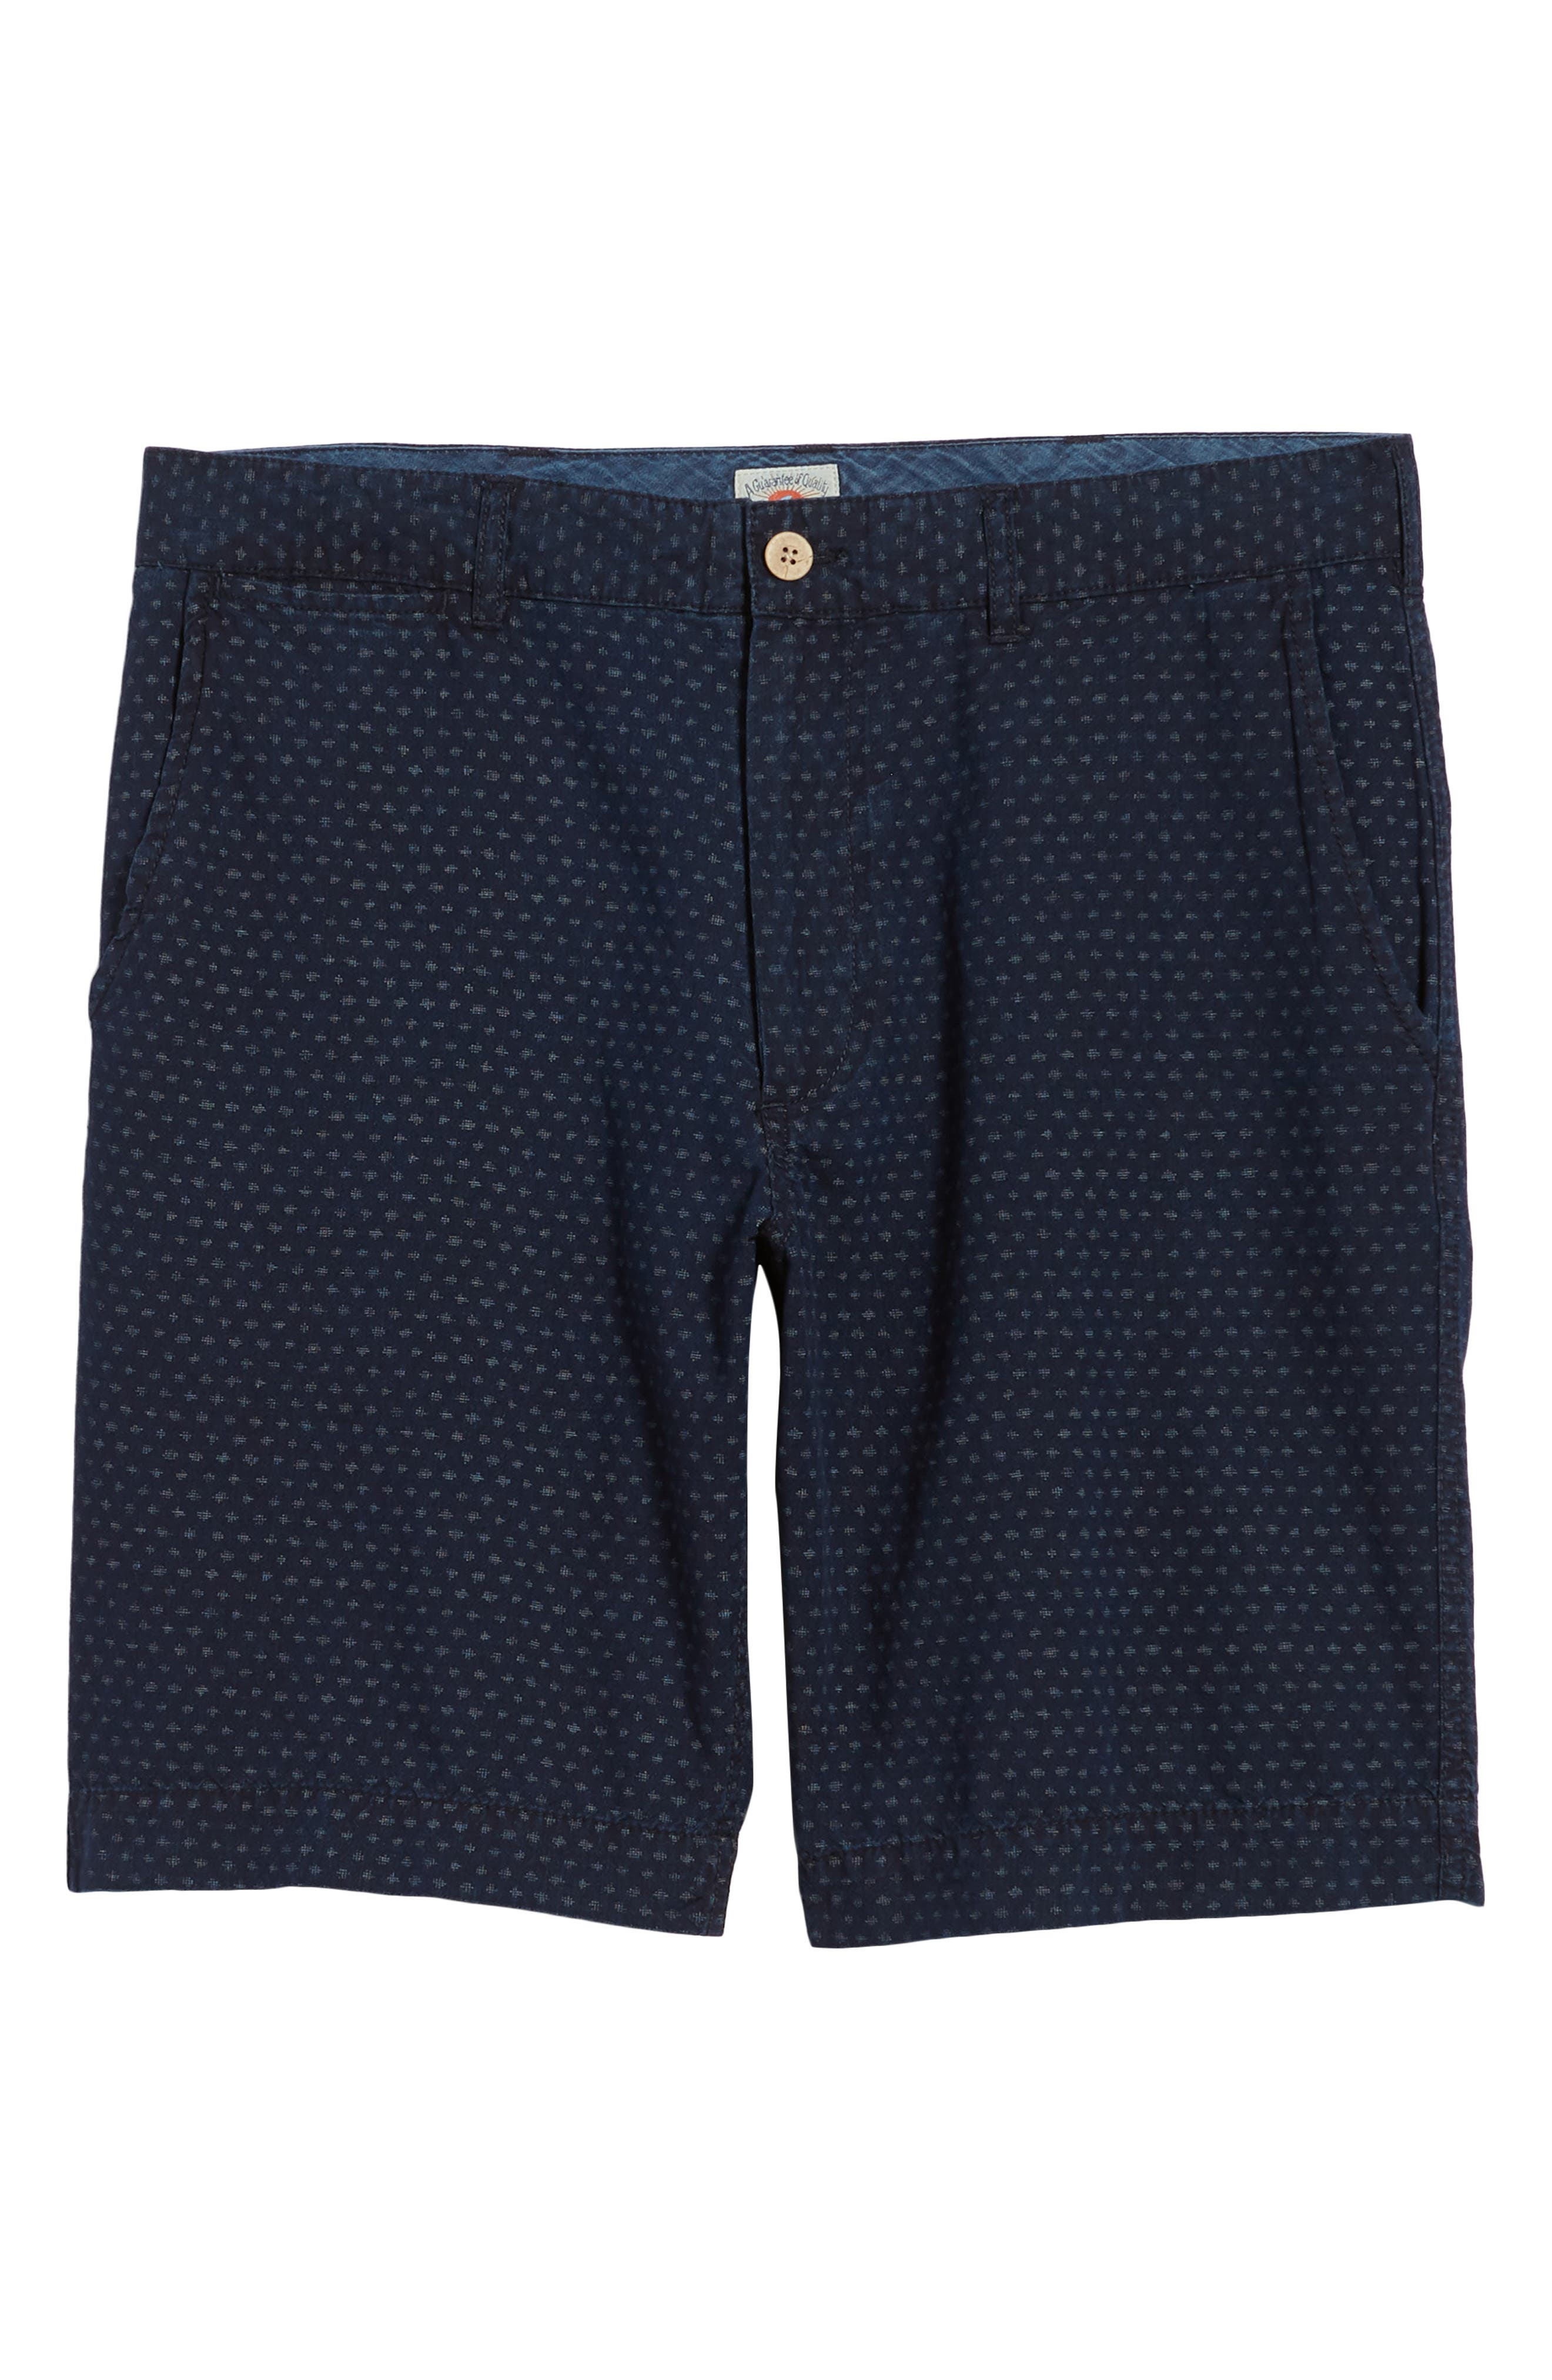 Asbury Shorts,                             Alternate thumbnail 6, color,